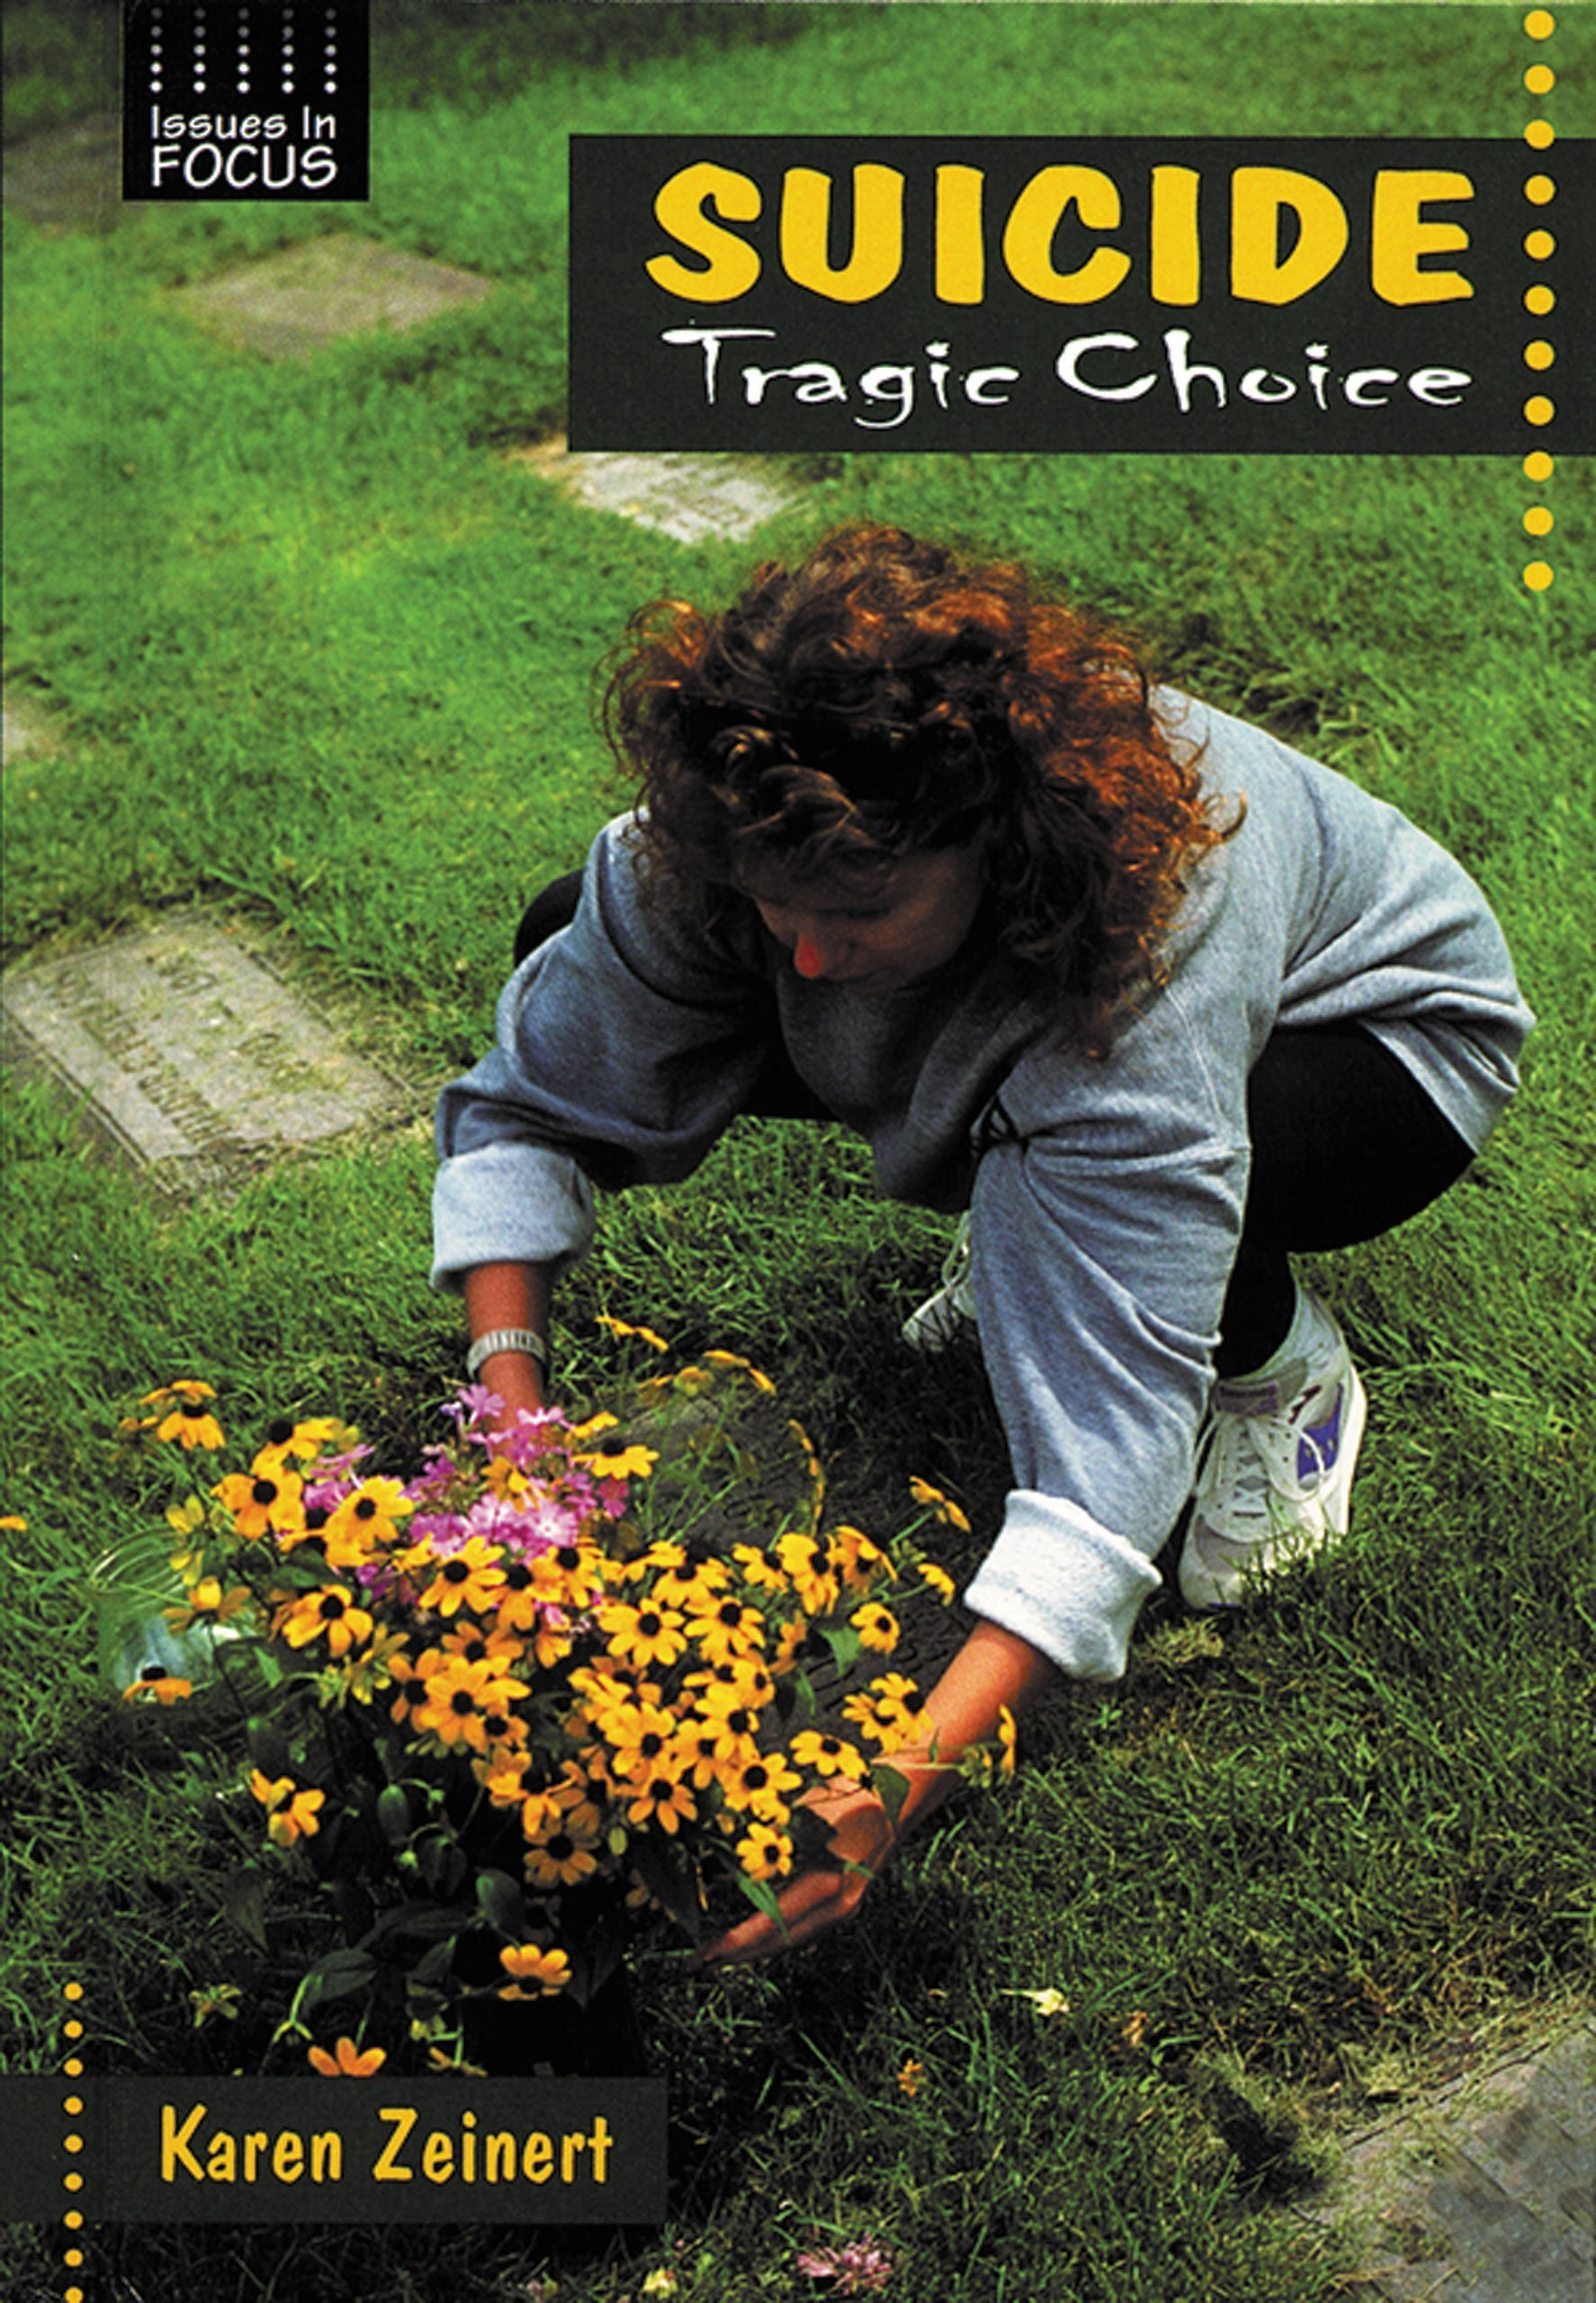 Suicide: Tragic Choice (Issues in Focus)